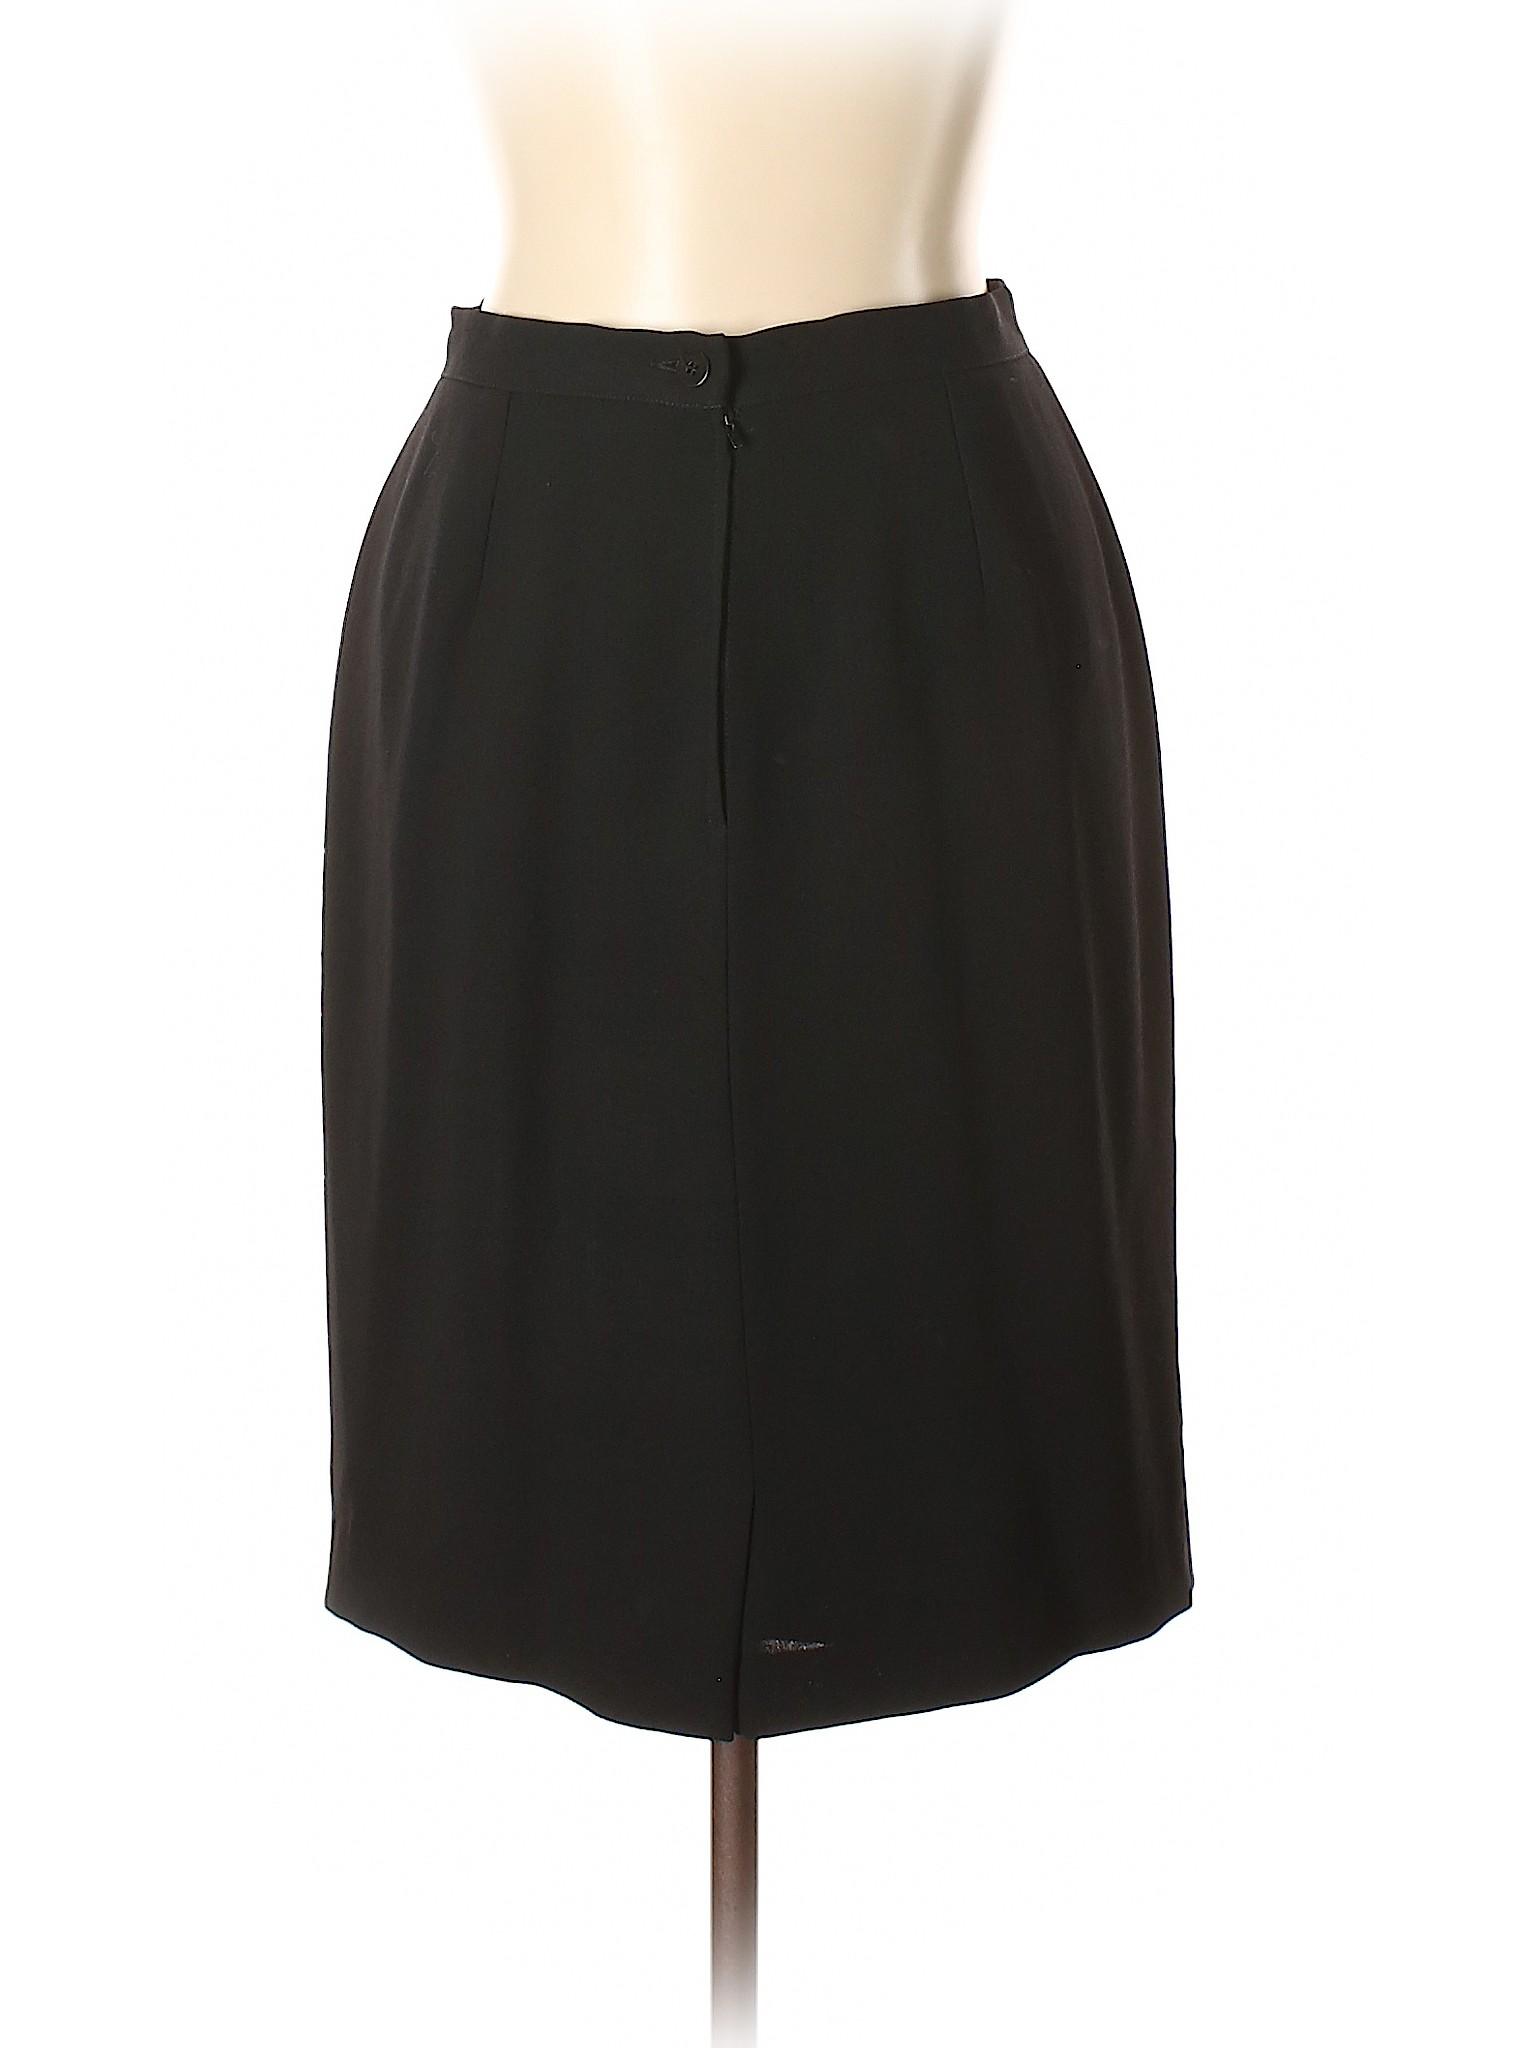 Boutique Skirt Casual Skirt Boutique Boutique Boutique Casual Boutique Casual Skirt Skirt Casual HXTnHwpFx